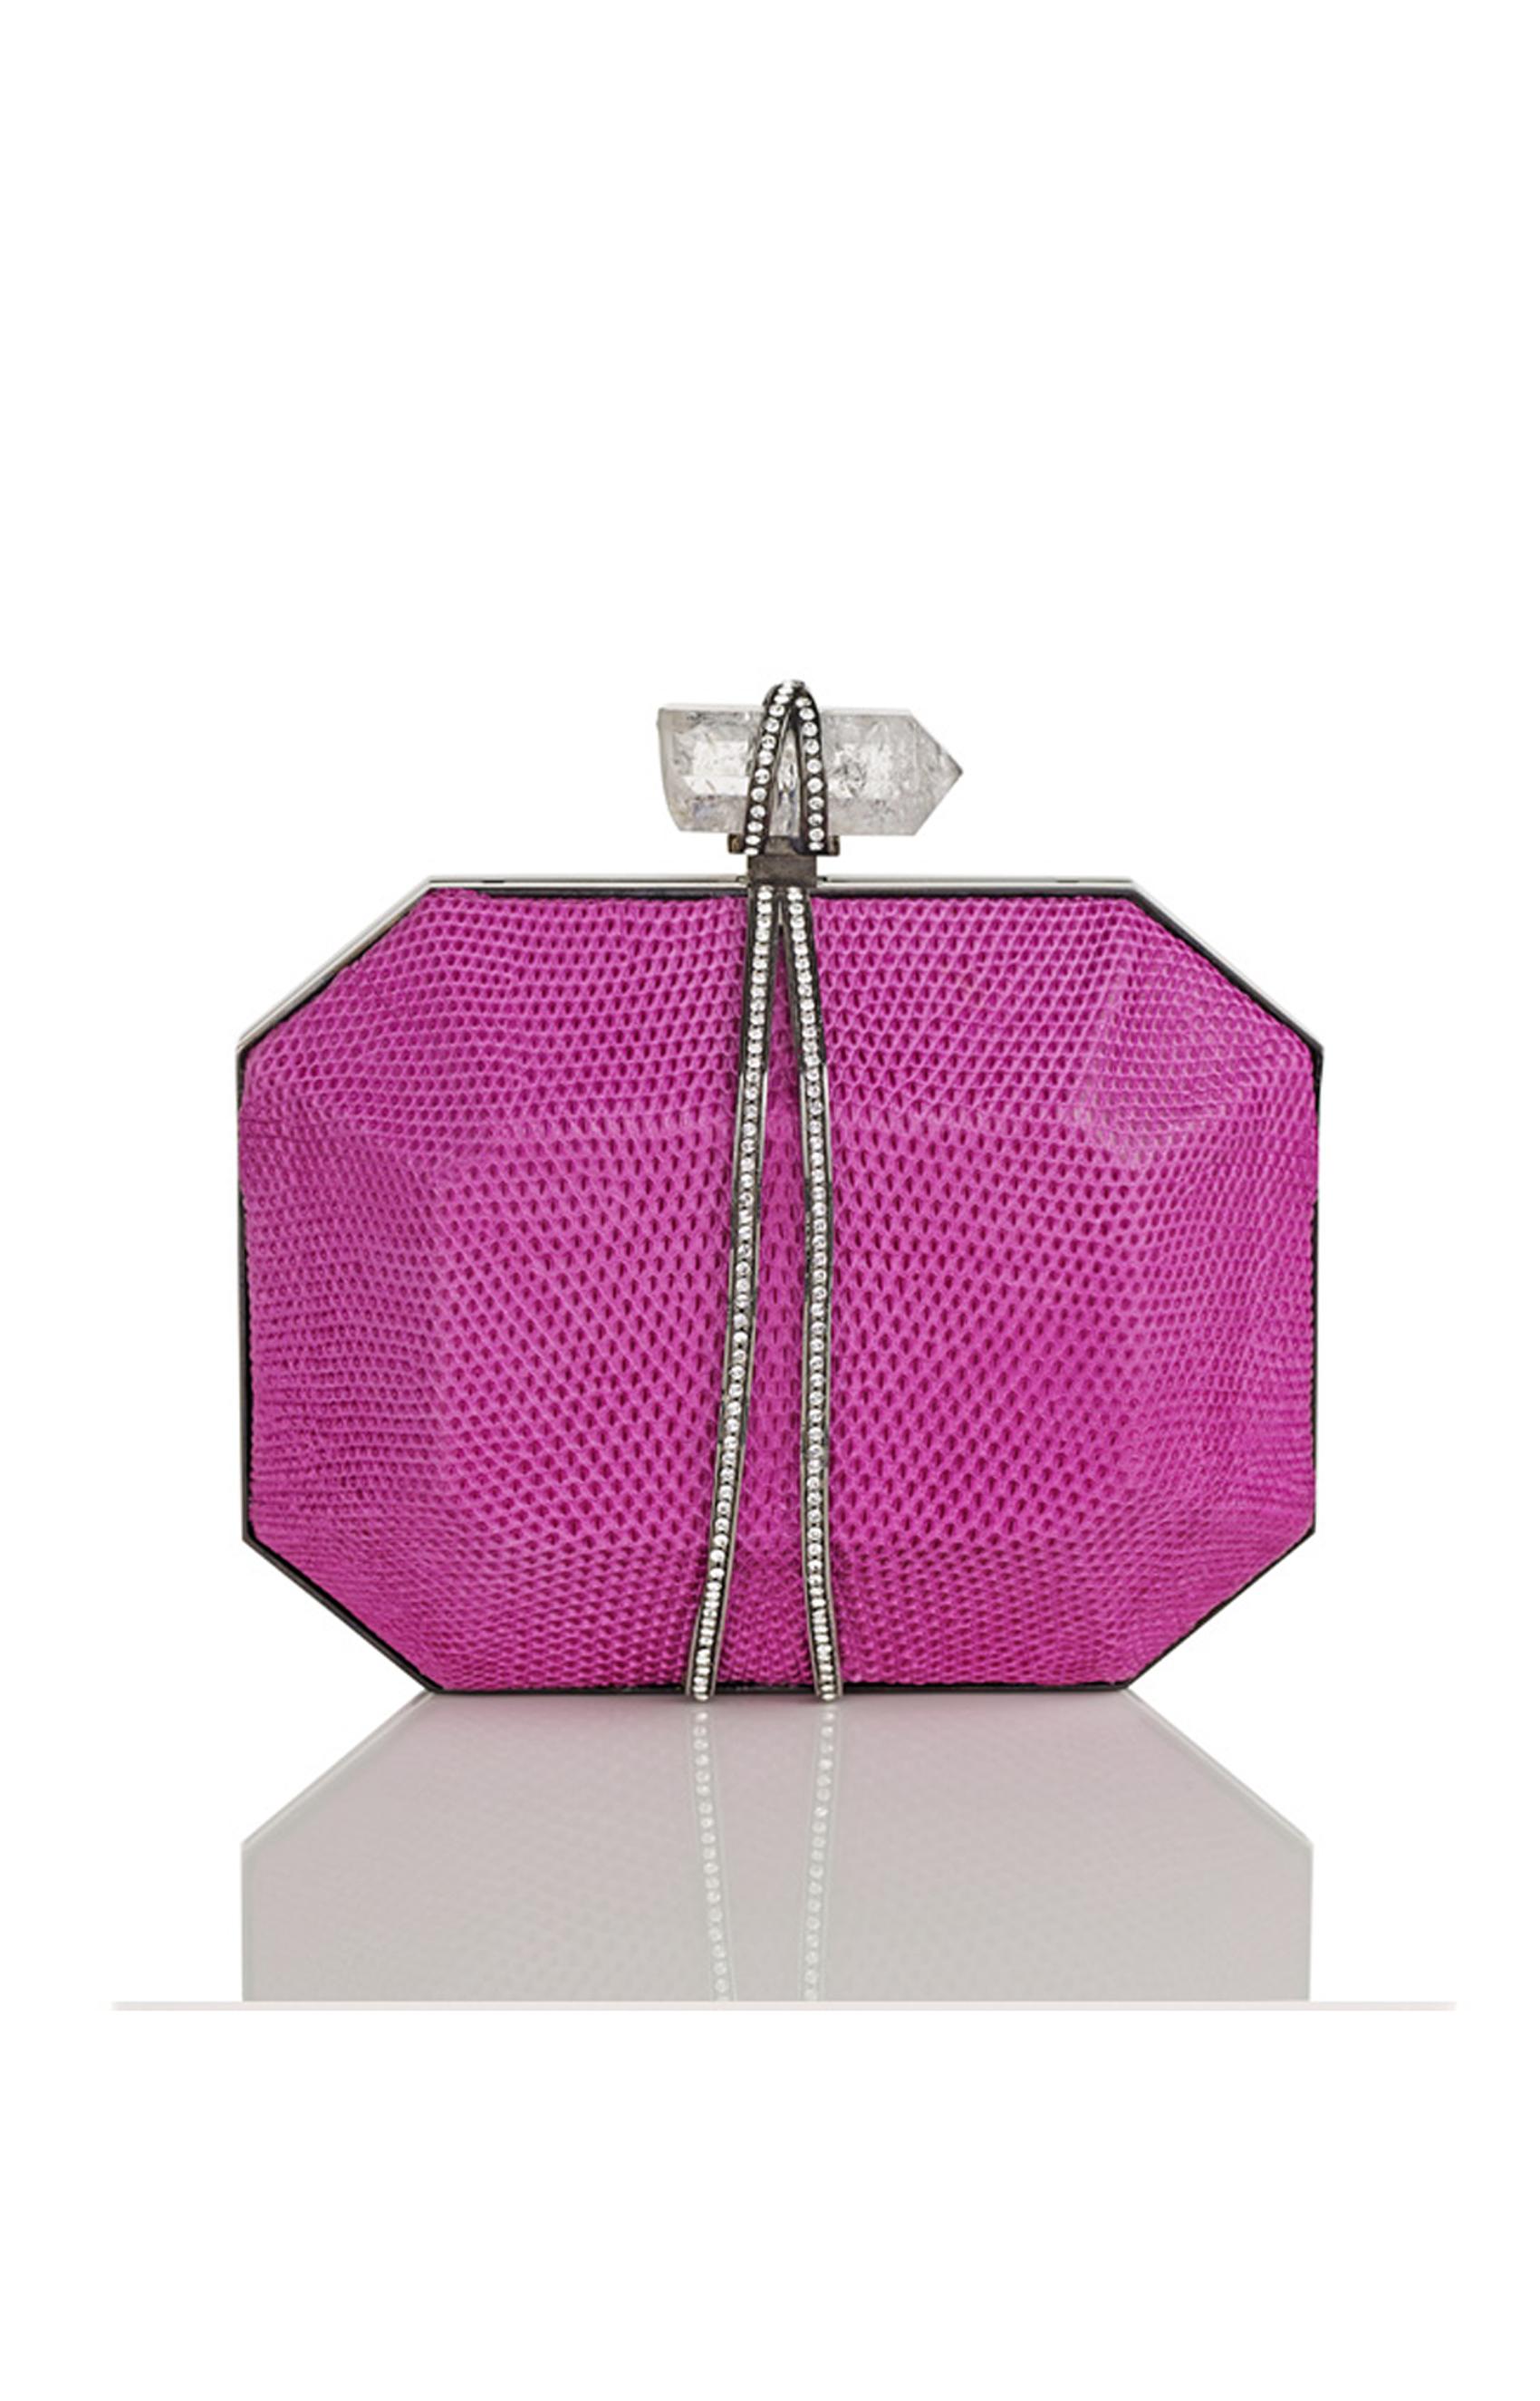 Marchesa <br>Handbag 07